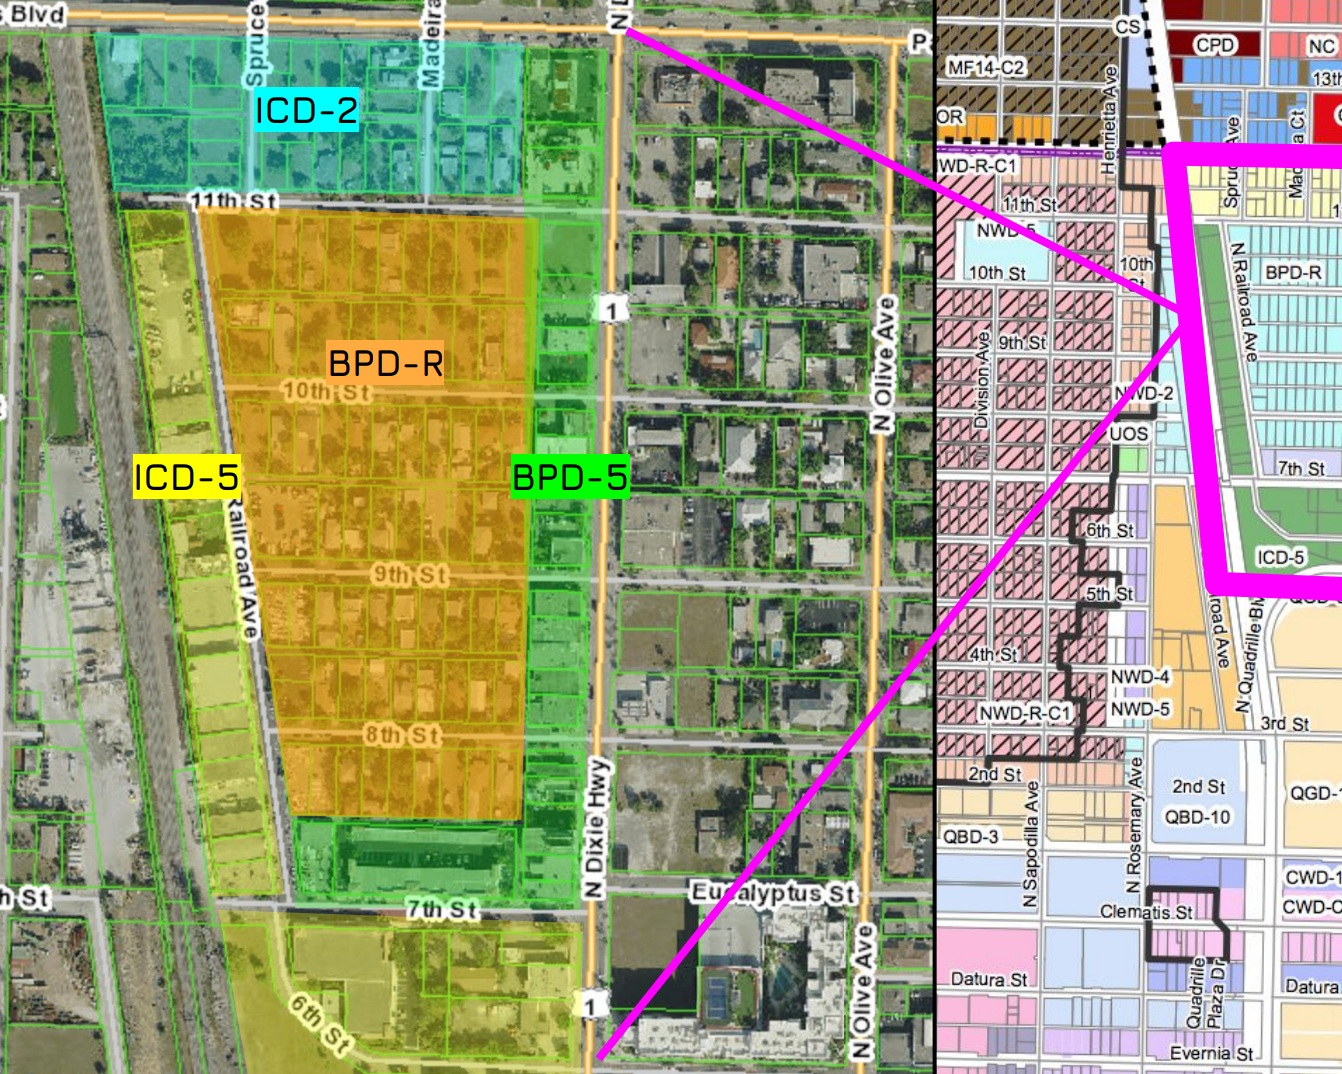 west palm beach development and neighborhood projects